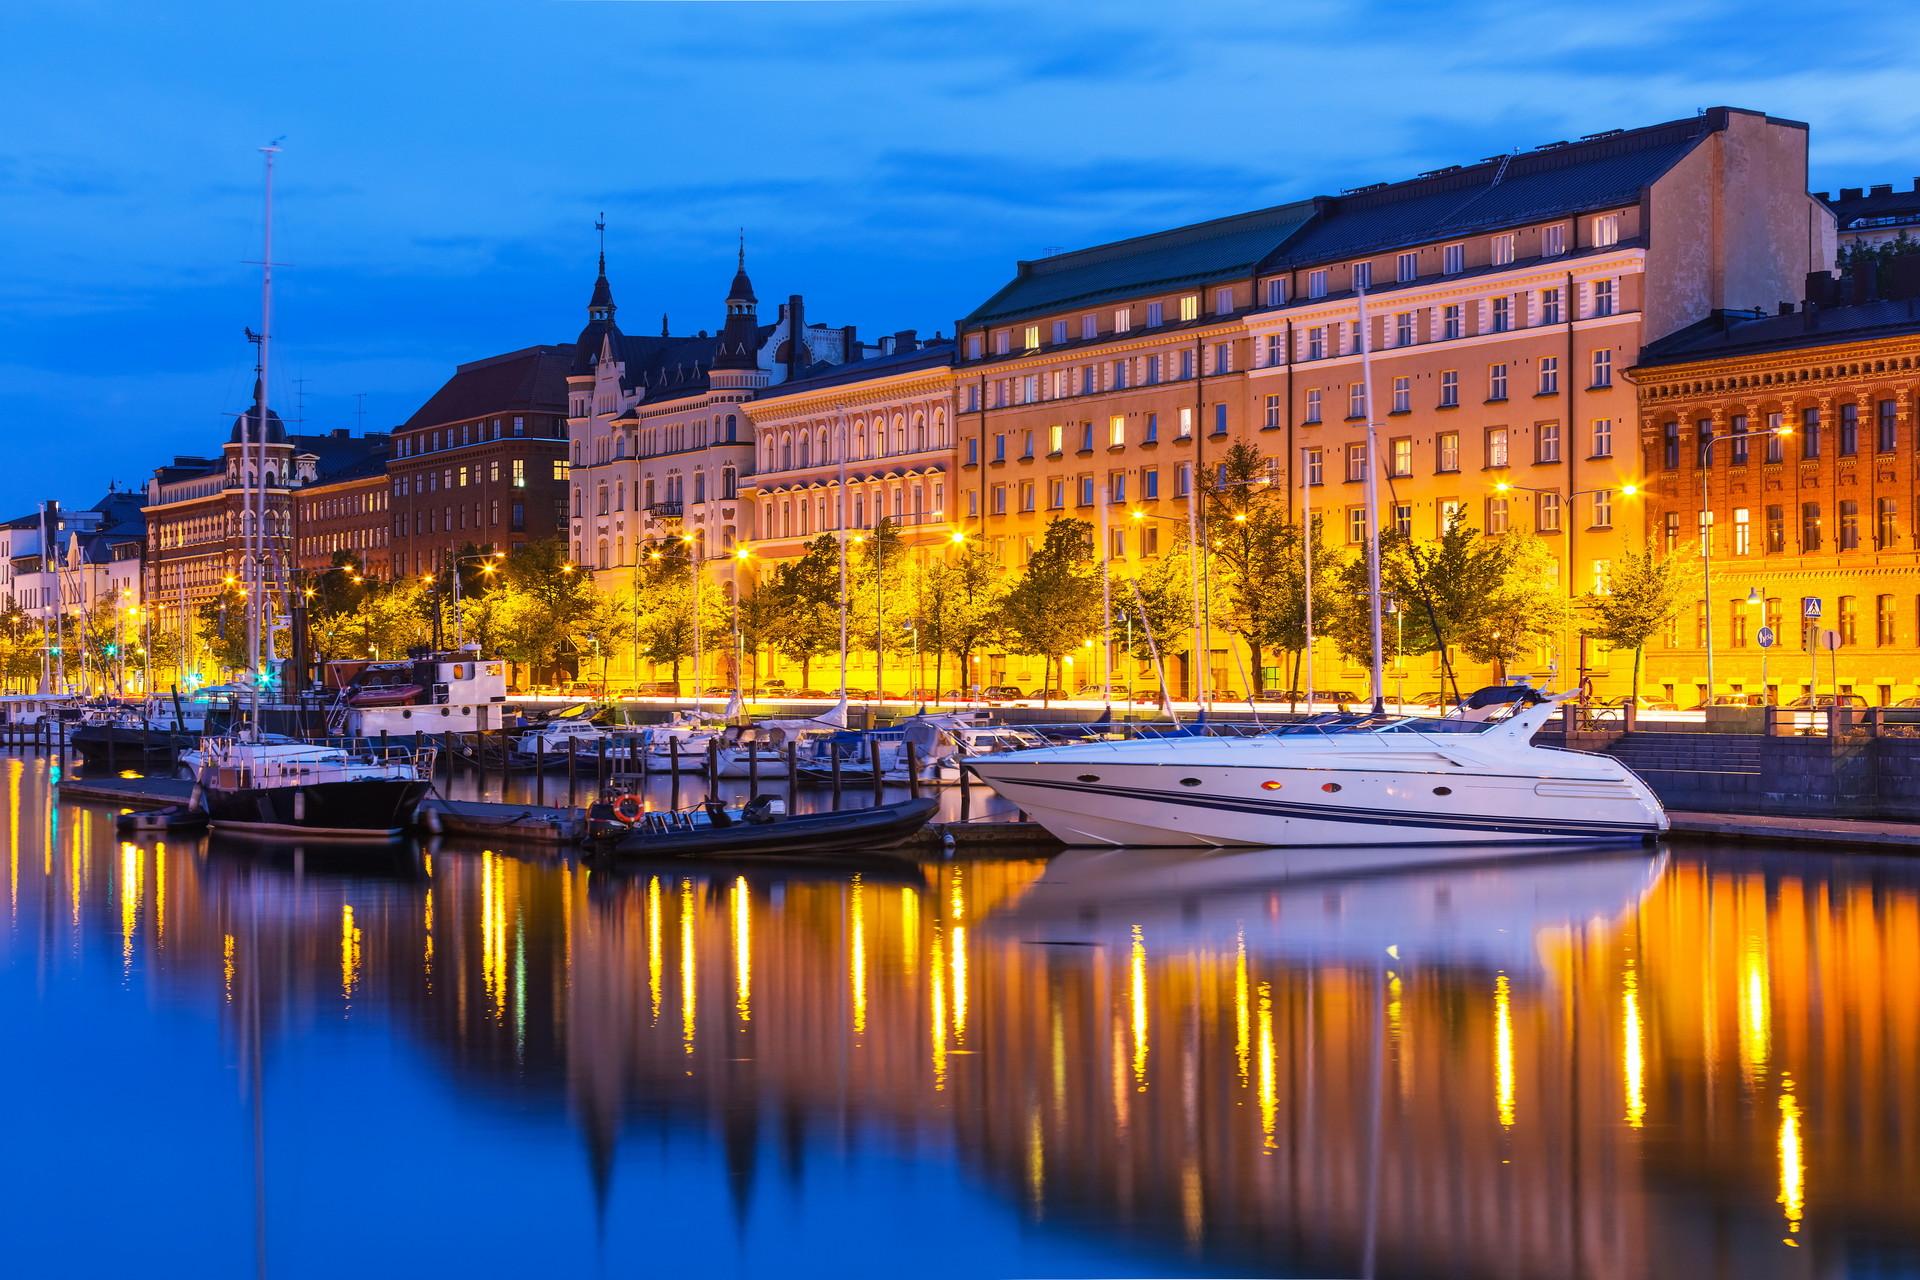 Expérience Erasmus à Helsinki, la Finlande par Daniel | Expérience Erasmus Helsinki